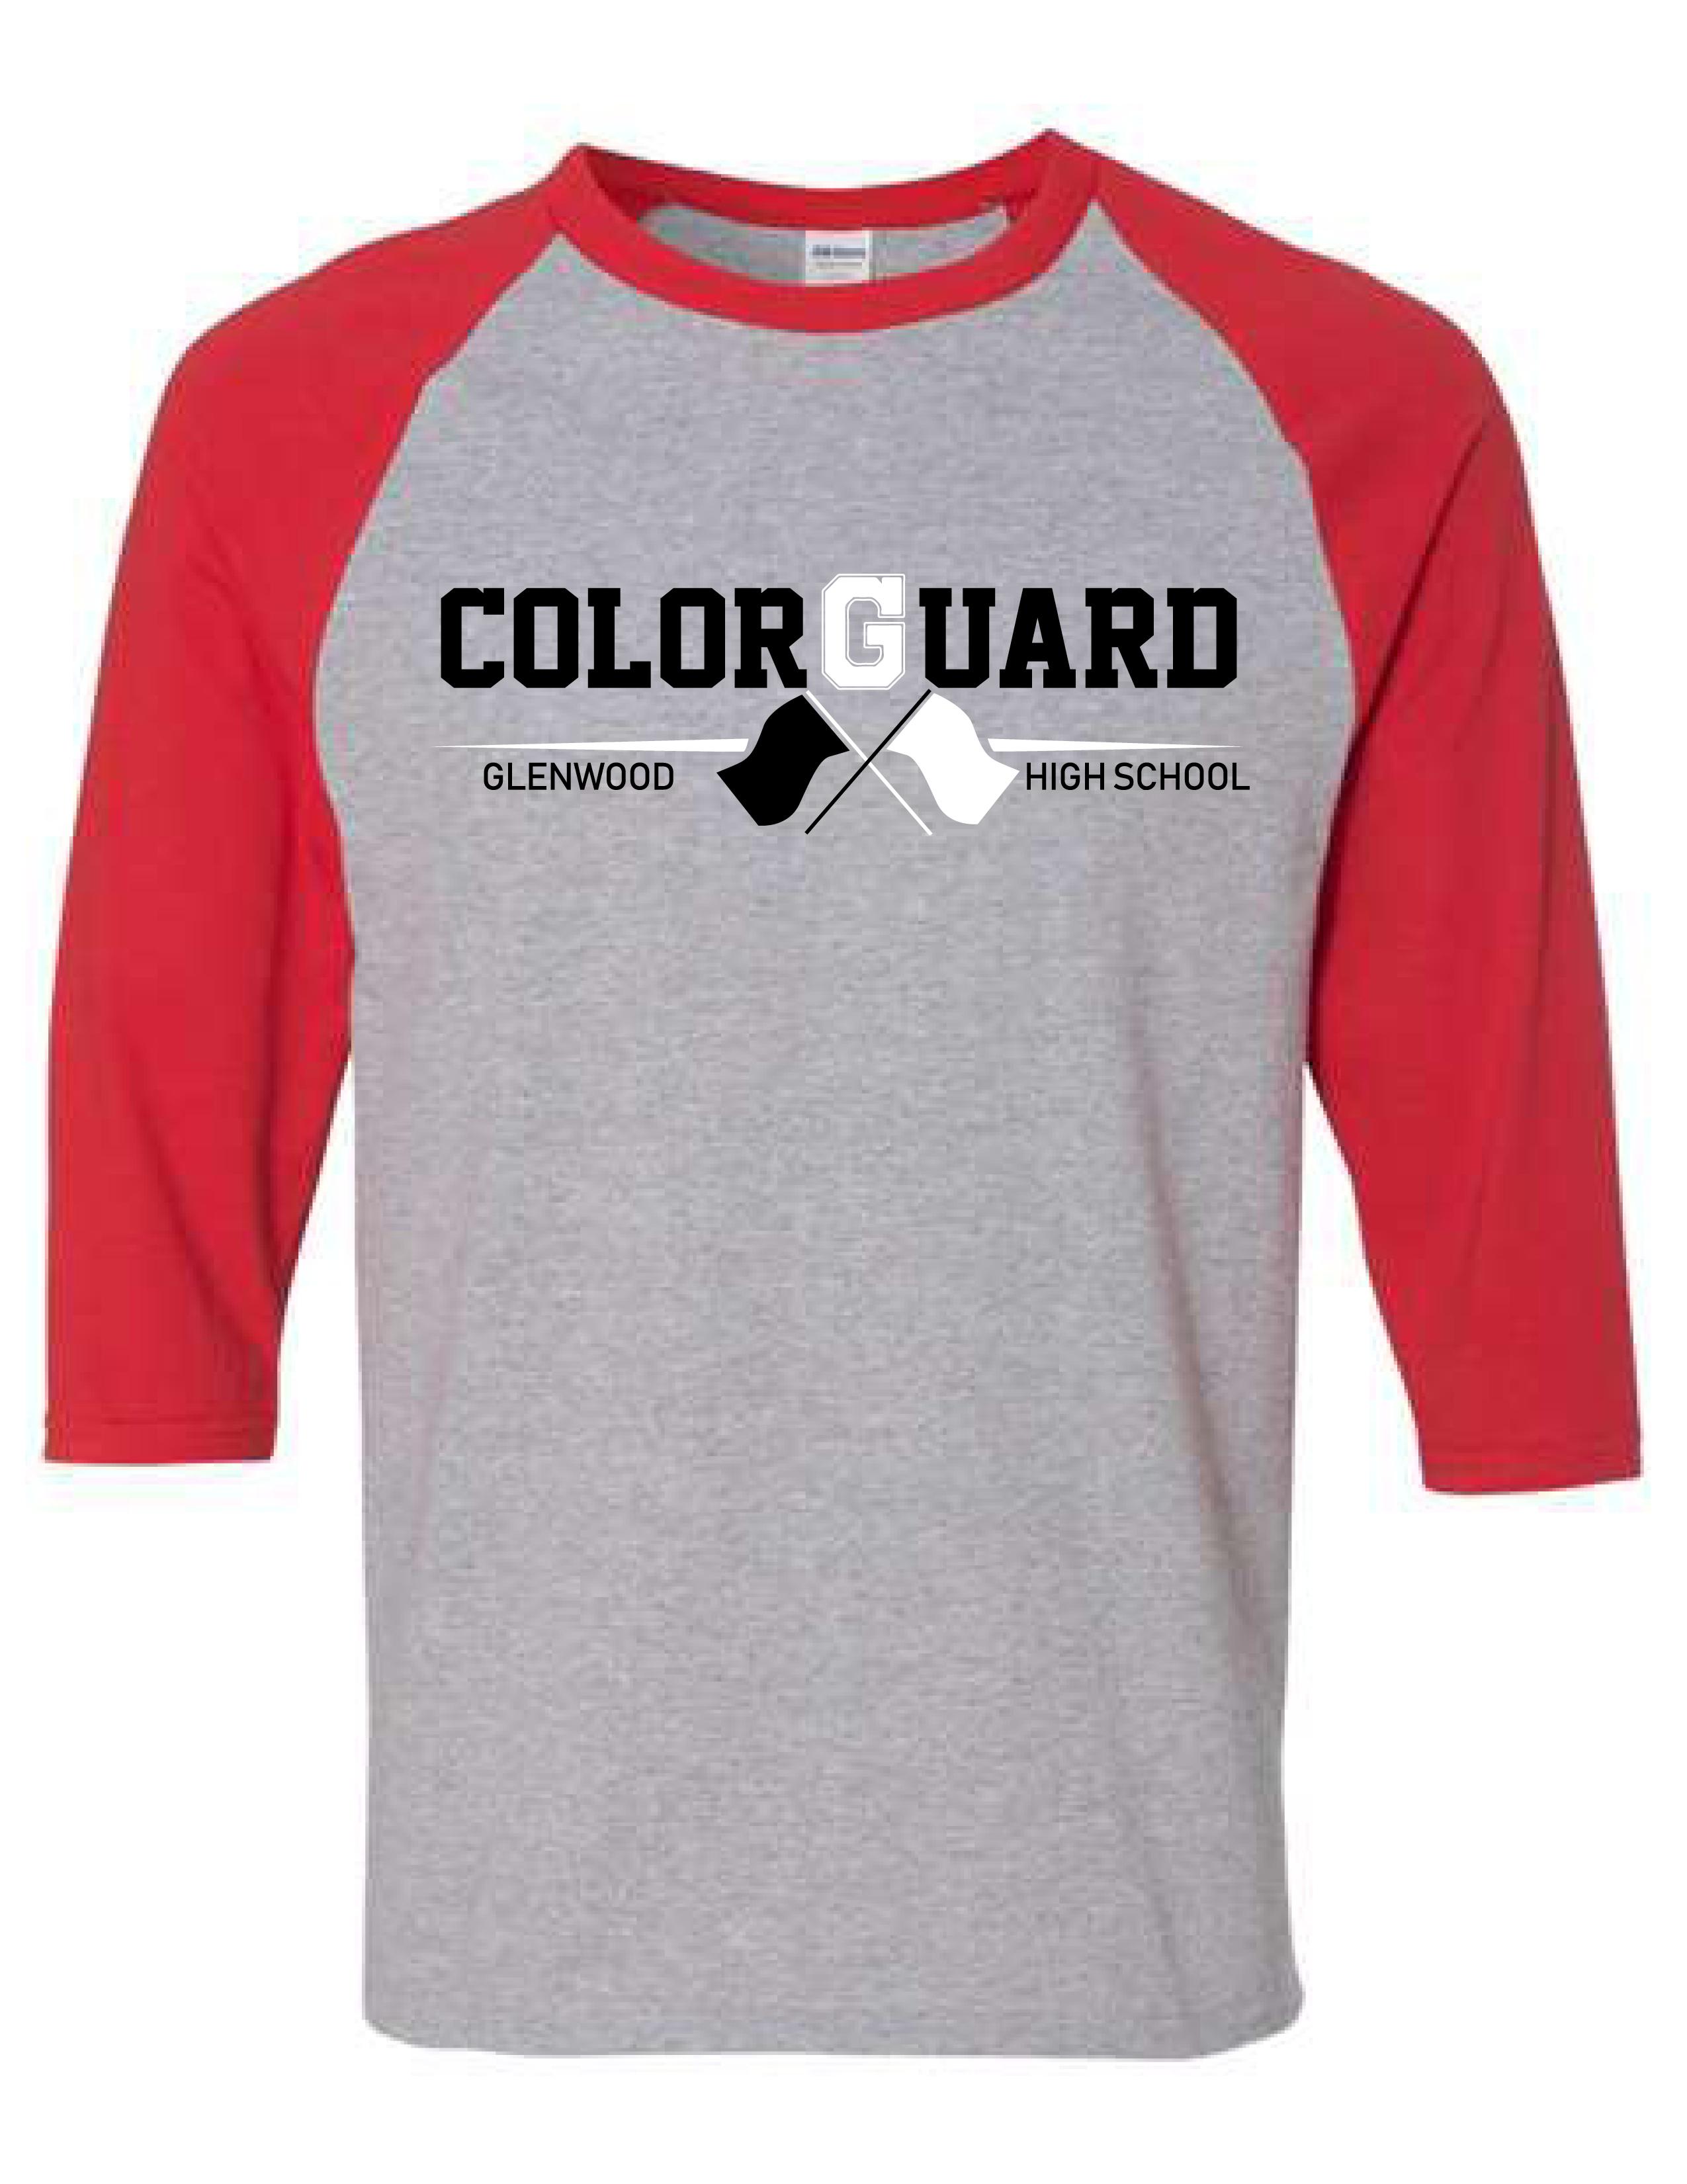 Glenwood Color Guard - Baseball Tee